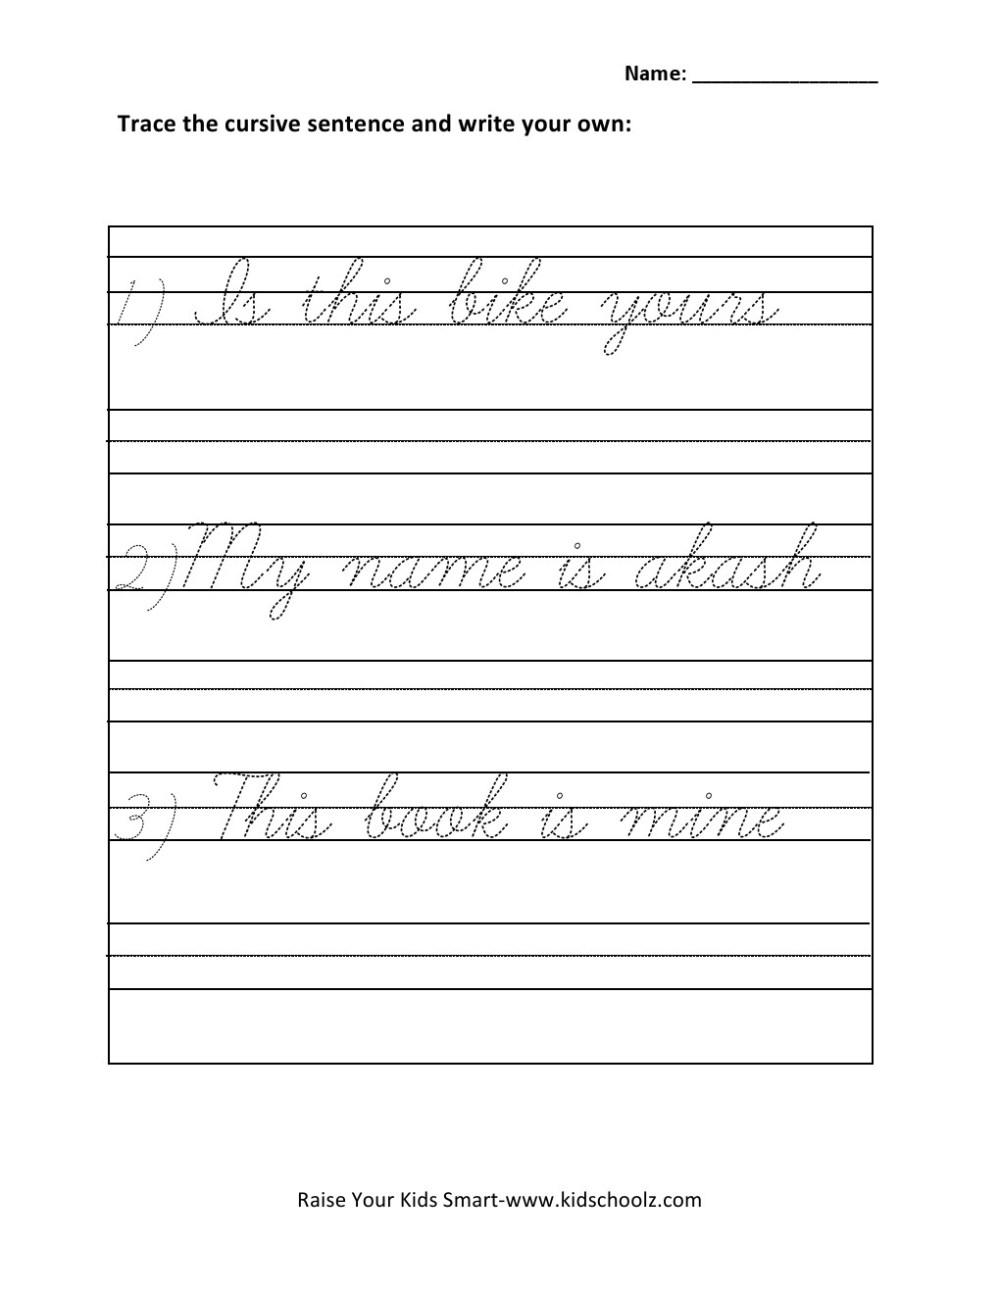 medium resolution of Grade 1 - Cursive Writing Sentences Worksheet 4 - Kidschoolz